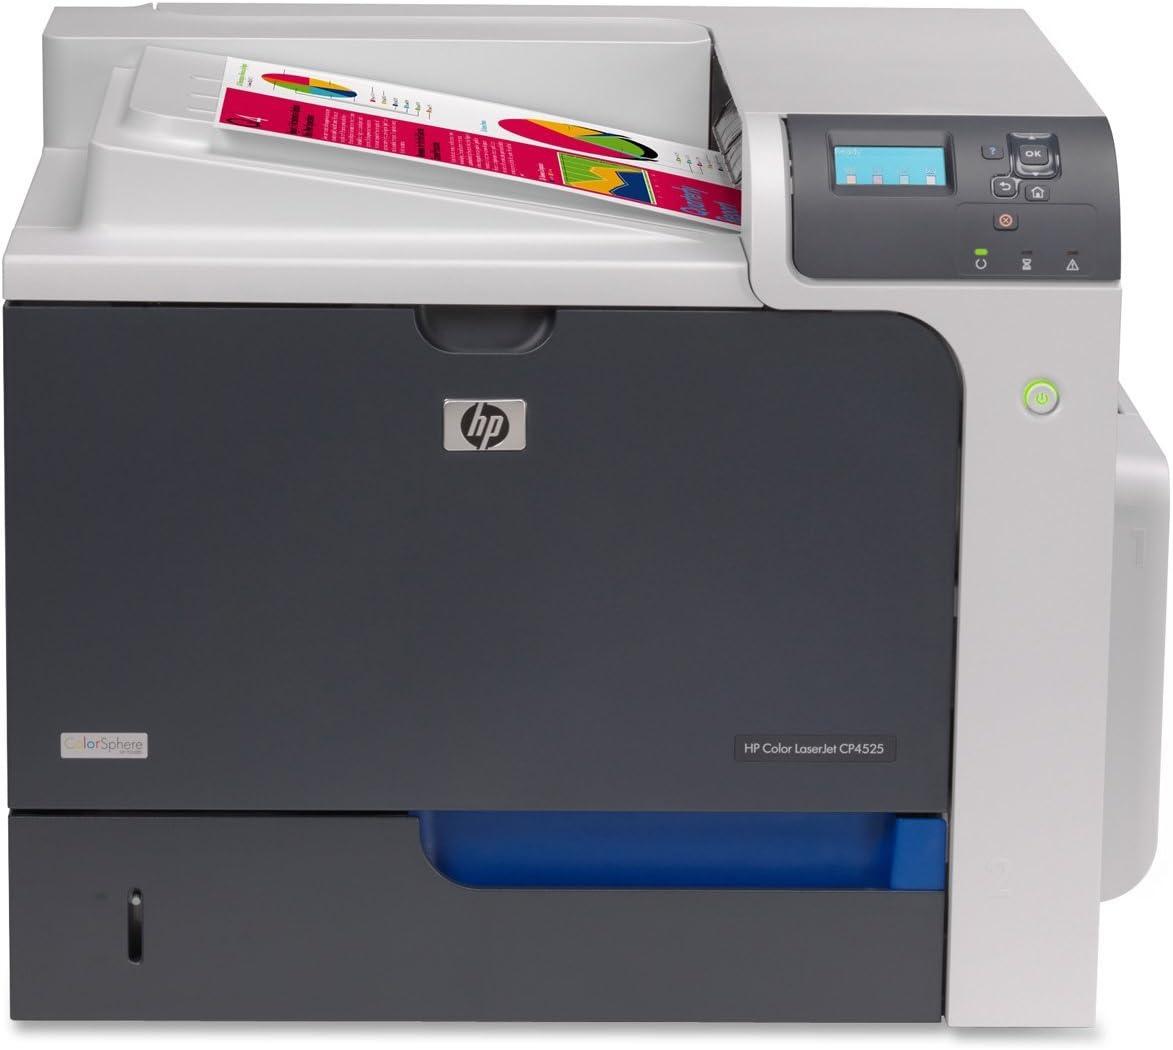 HP Color LaserJet CP4525N CP4525 CC493A Laser Printer - (Renewed)